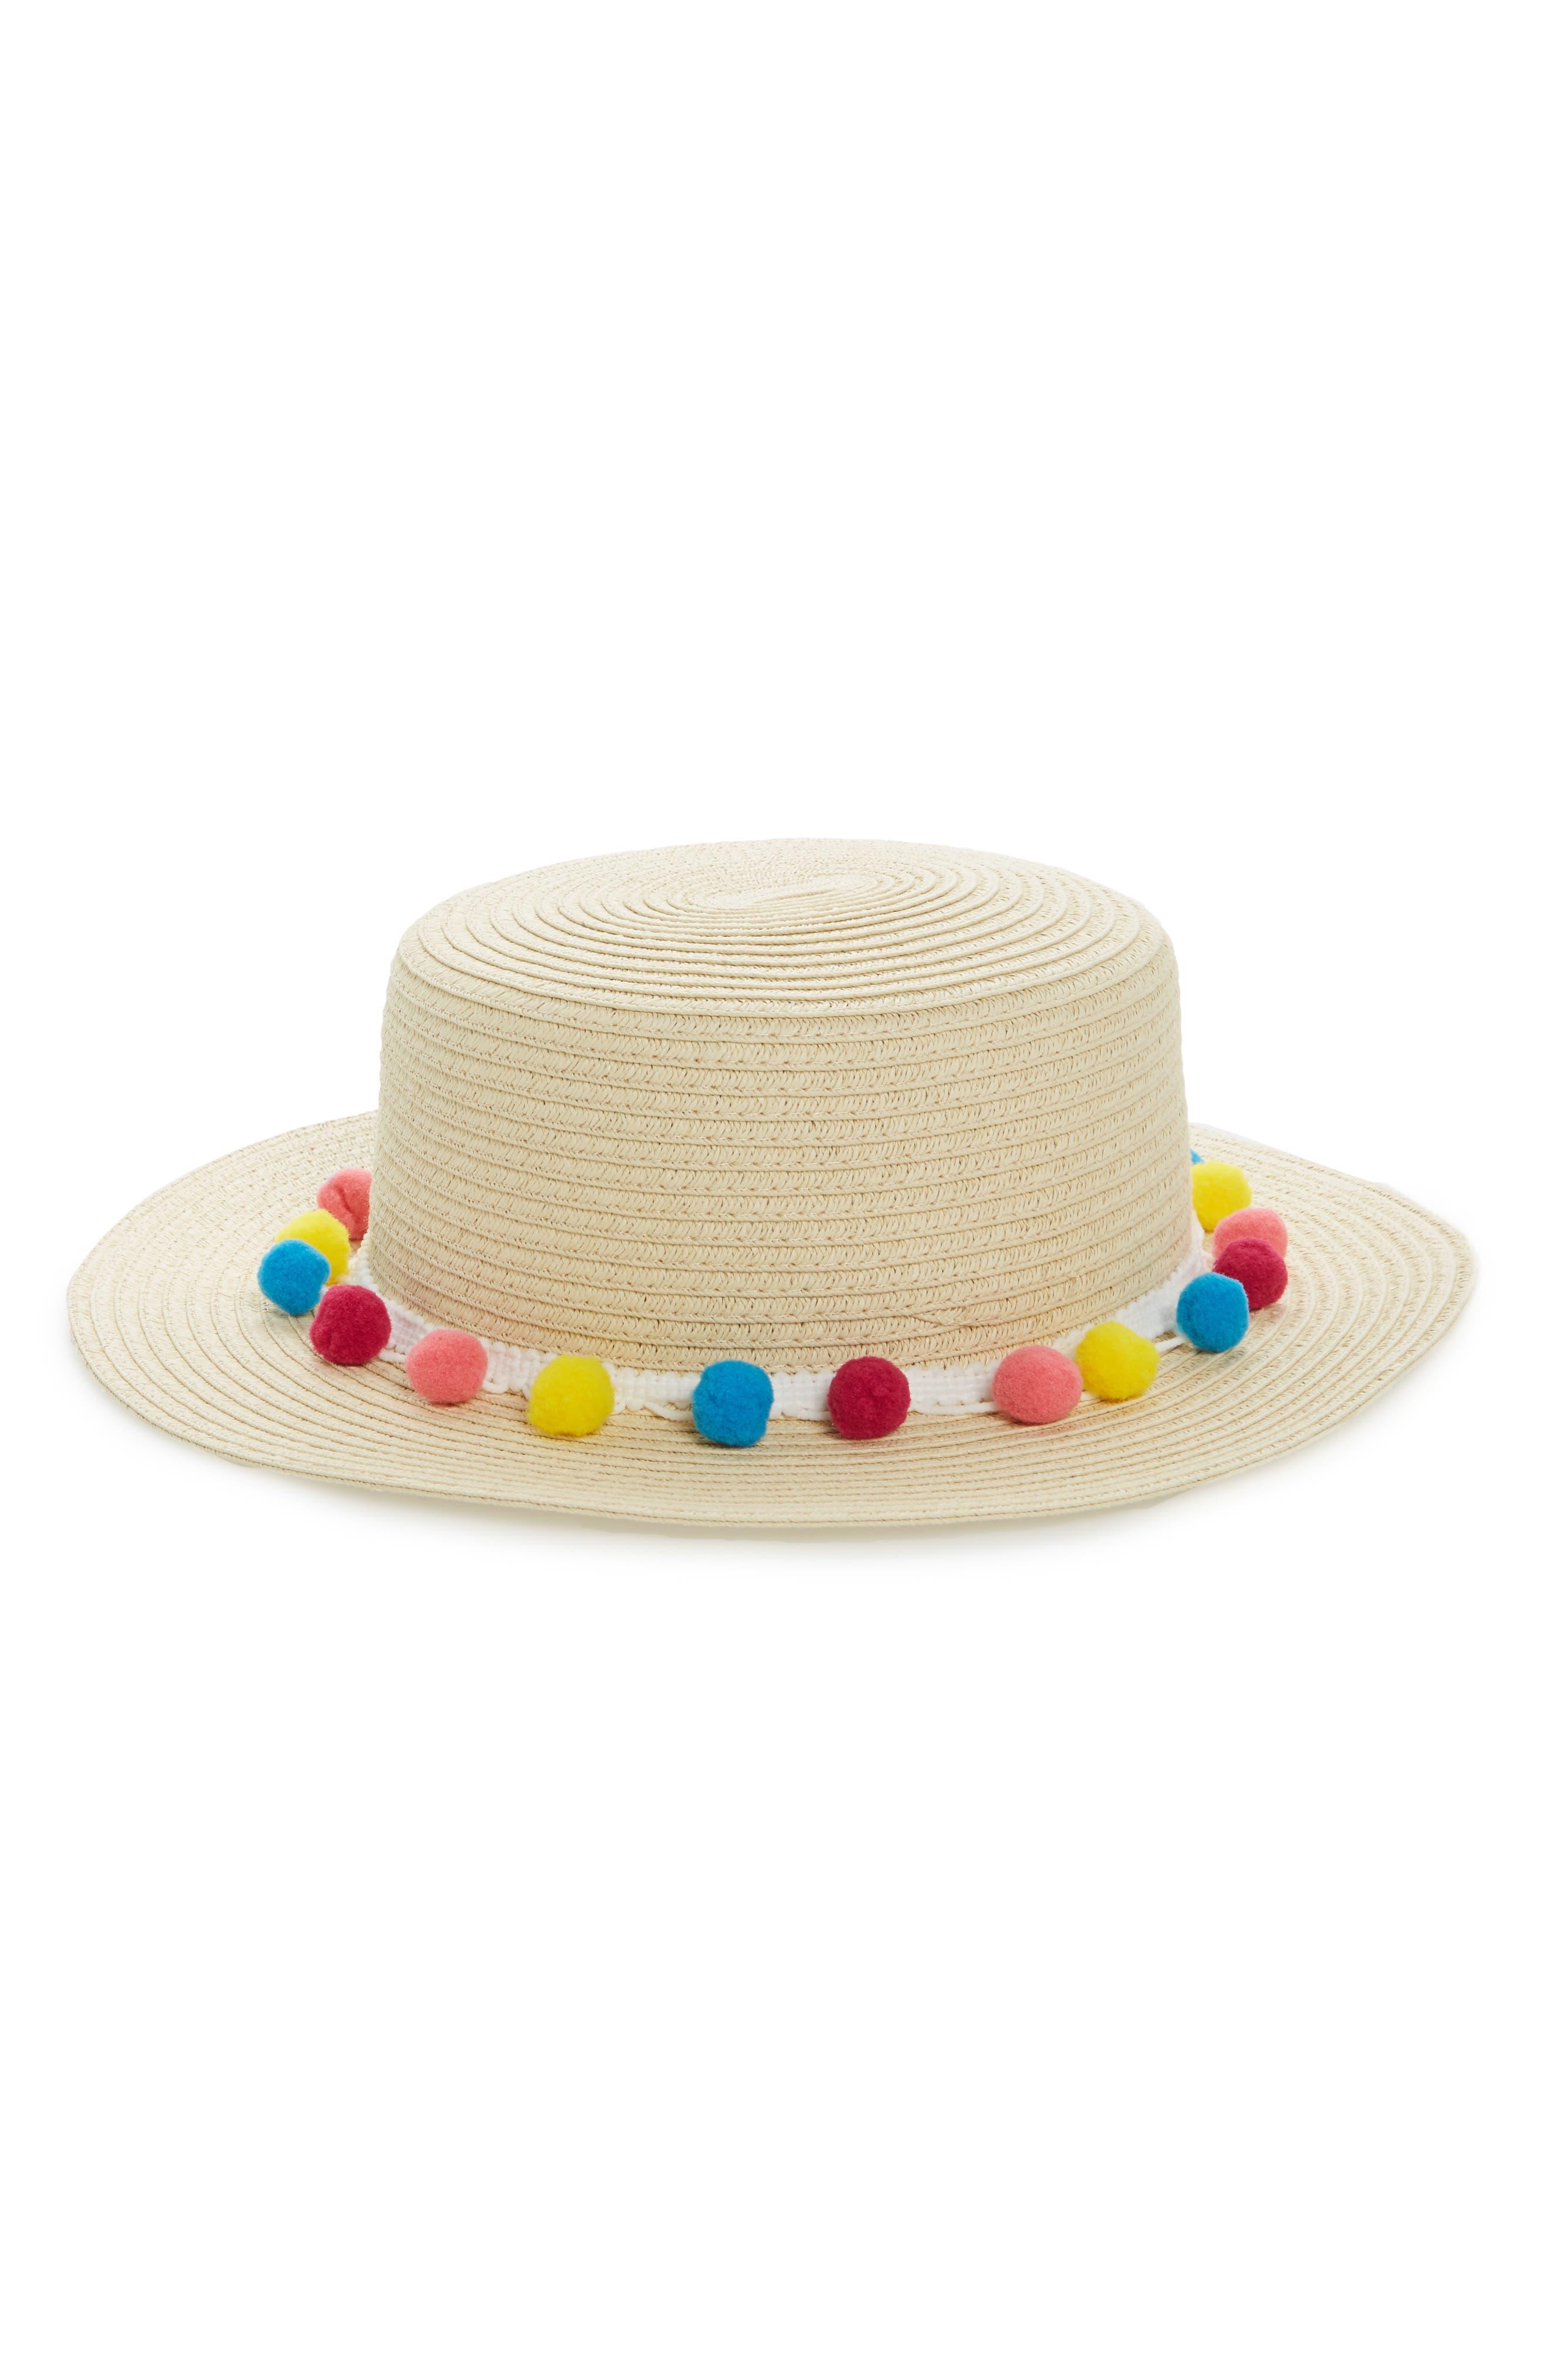 BP. Pom Band Straw Boater Hat